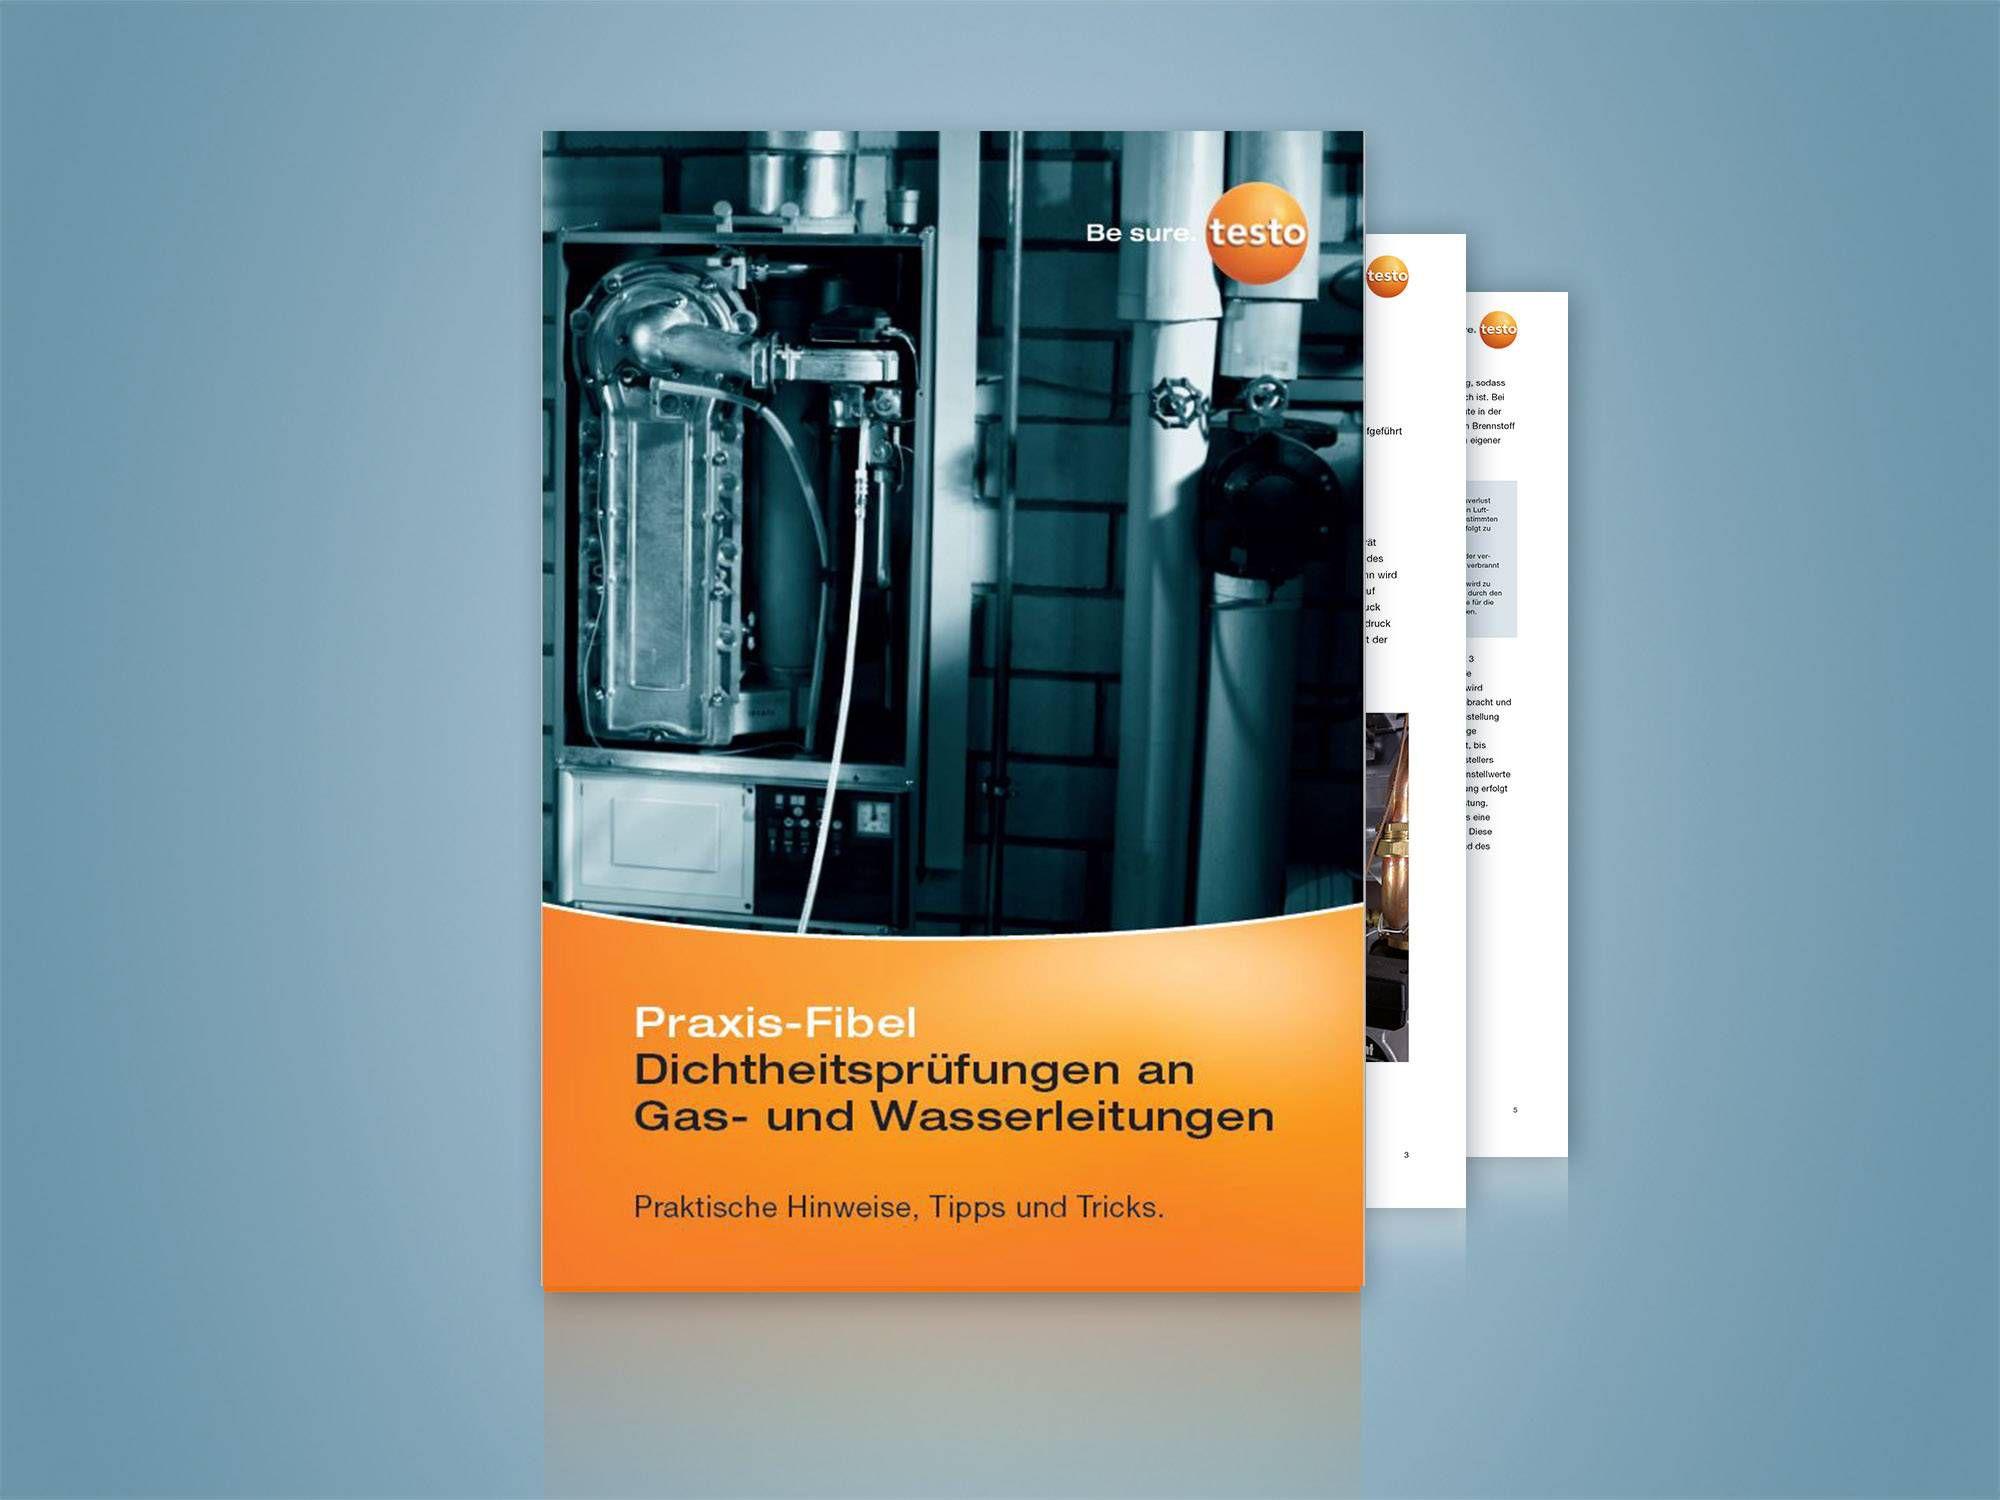 Praxis-Fibel: Dichtheitsprüfungen an Gas- und Wasserleitungen